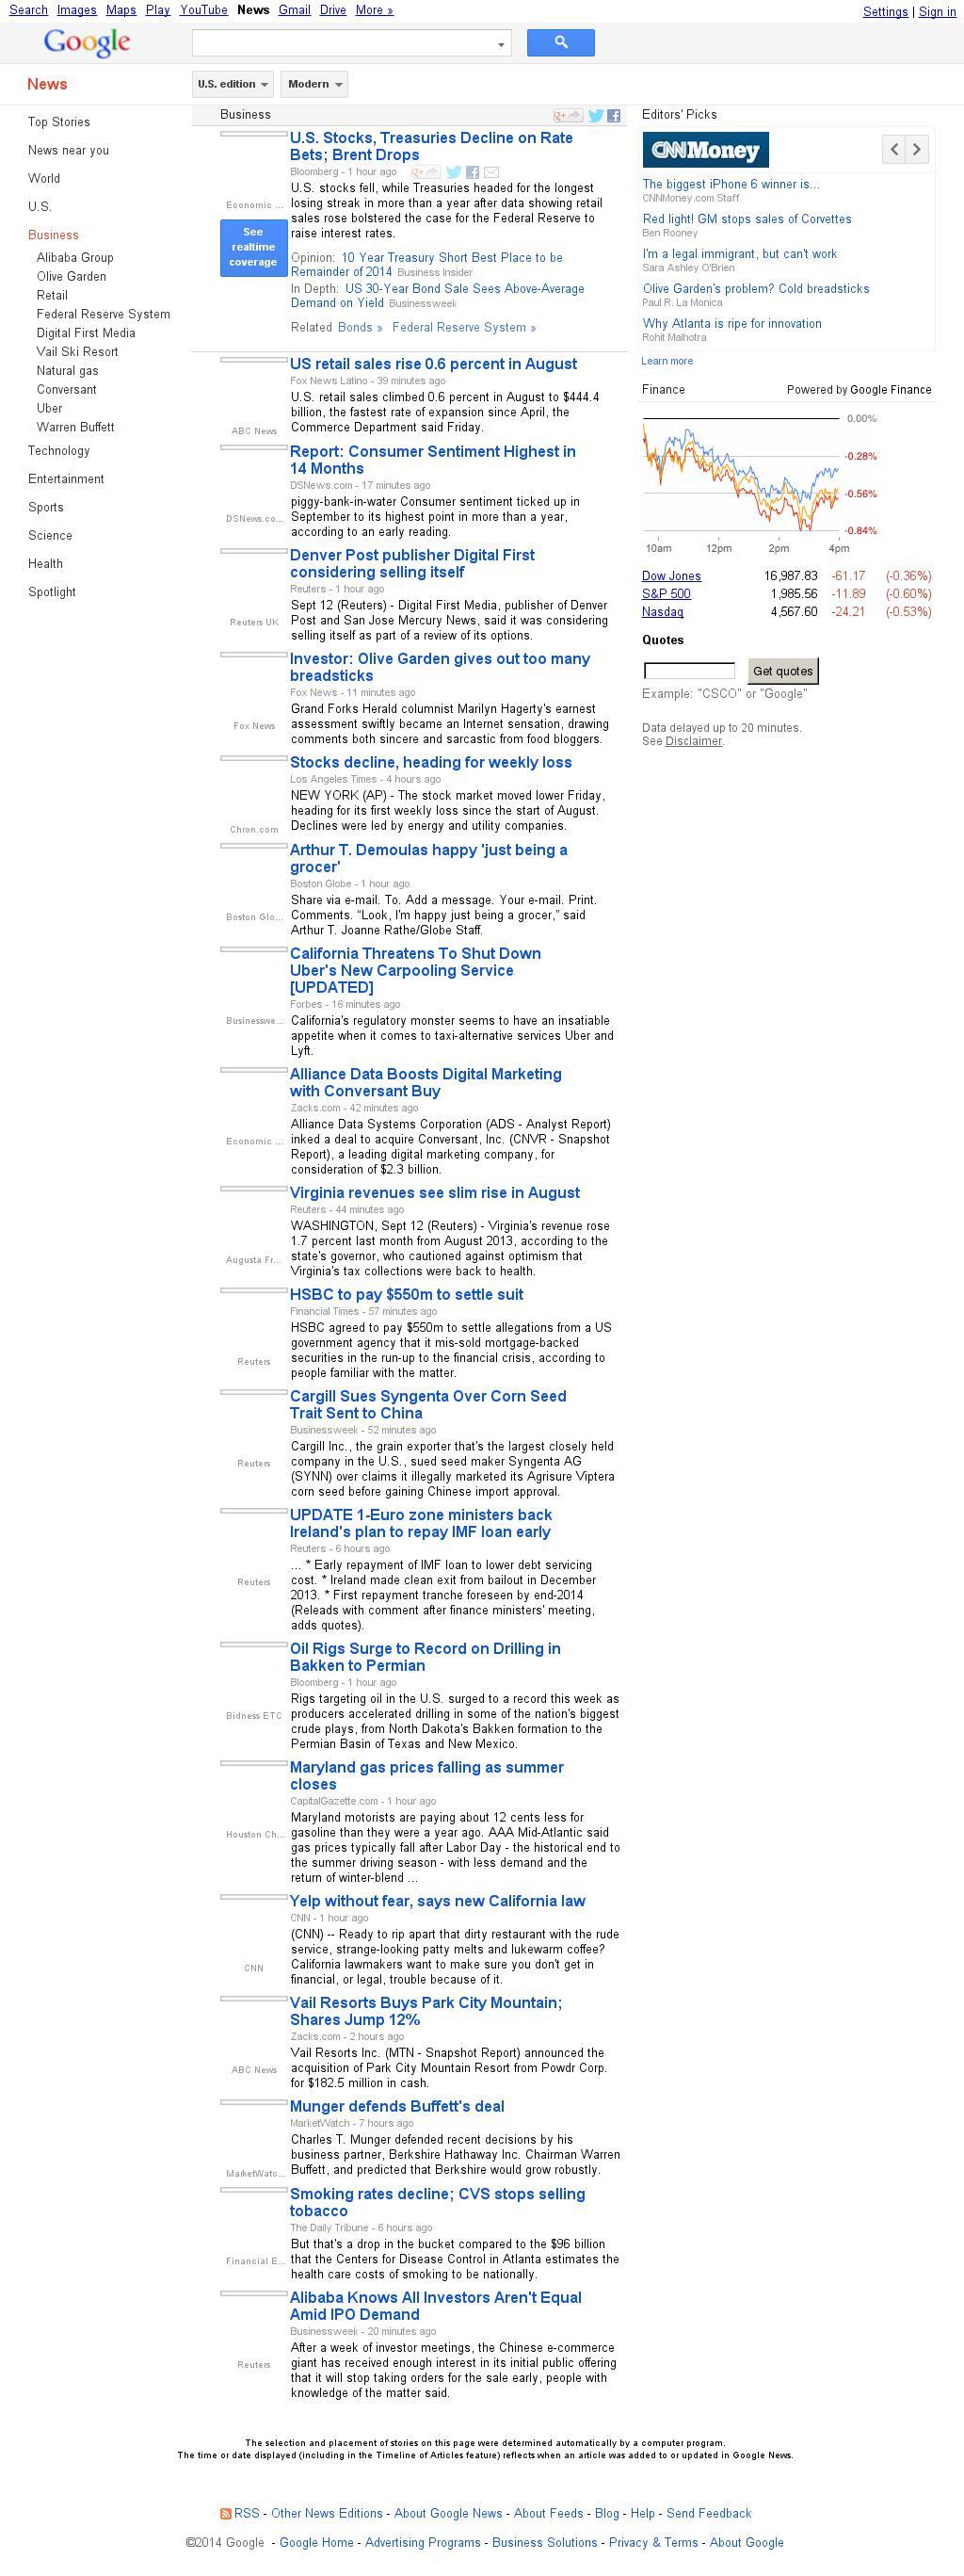 Google News: Business at Friday Sept. 12, 2014, 8:07 p.m. UTC